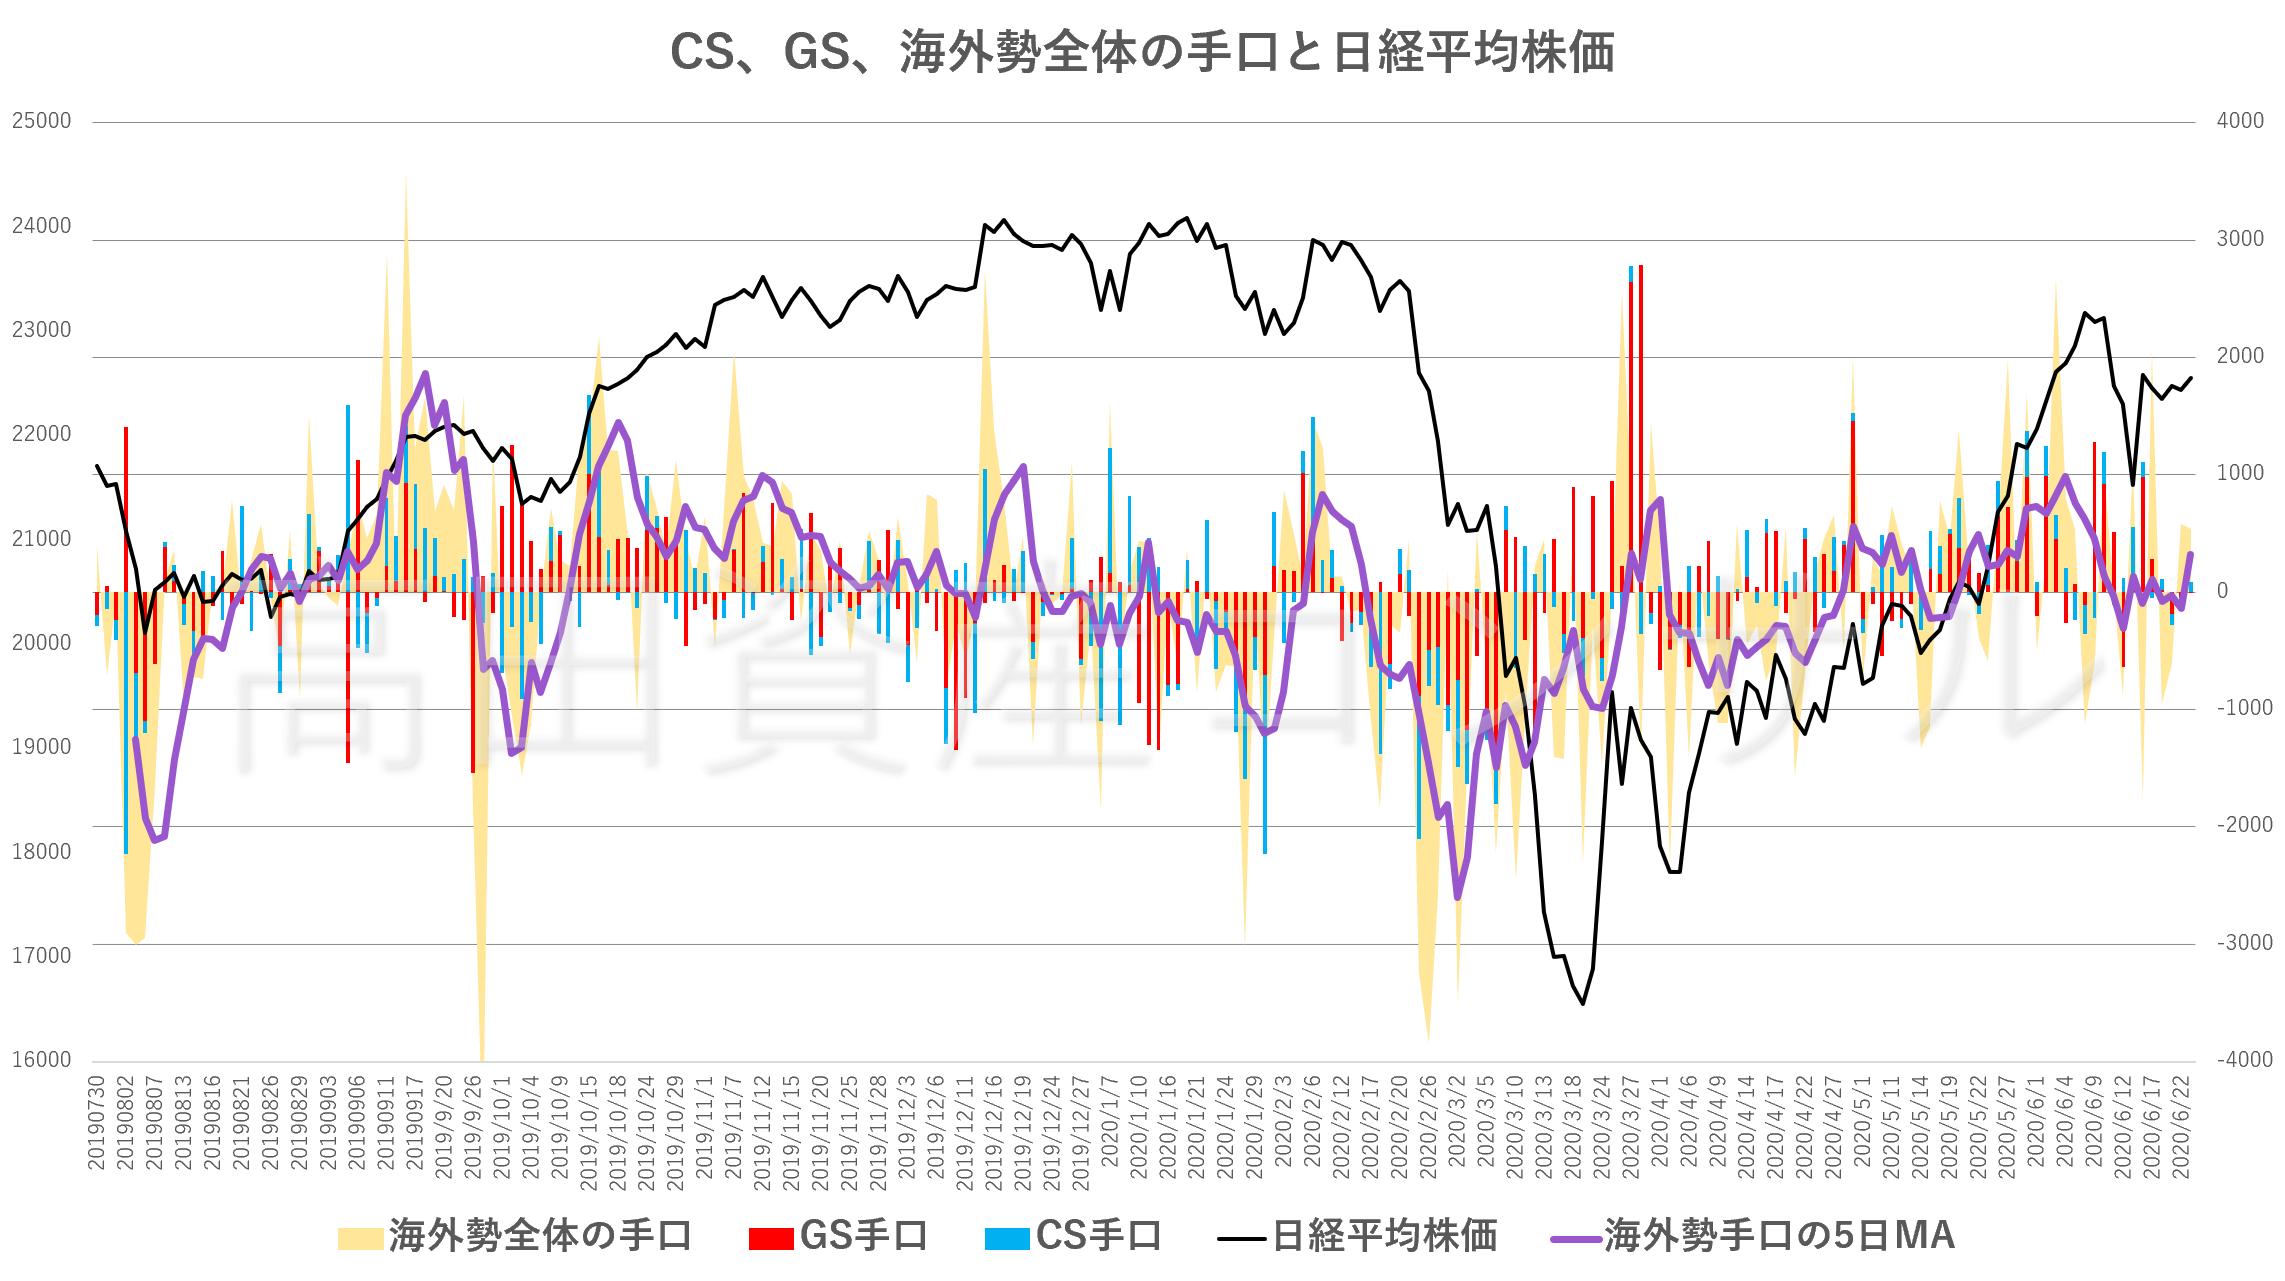 CS、GS、海外勢全体の手口と日経平均株価20200623